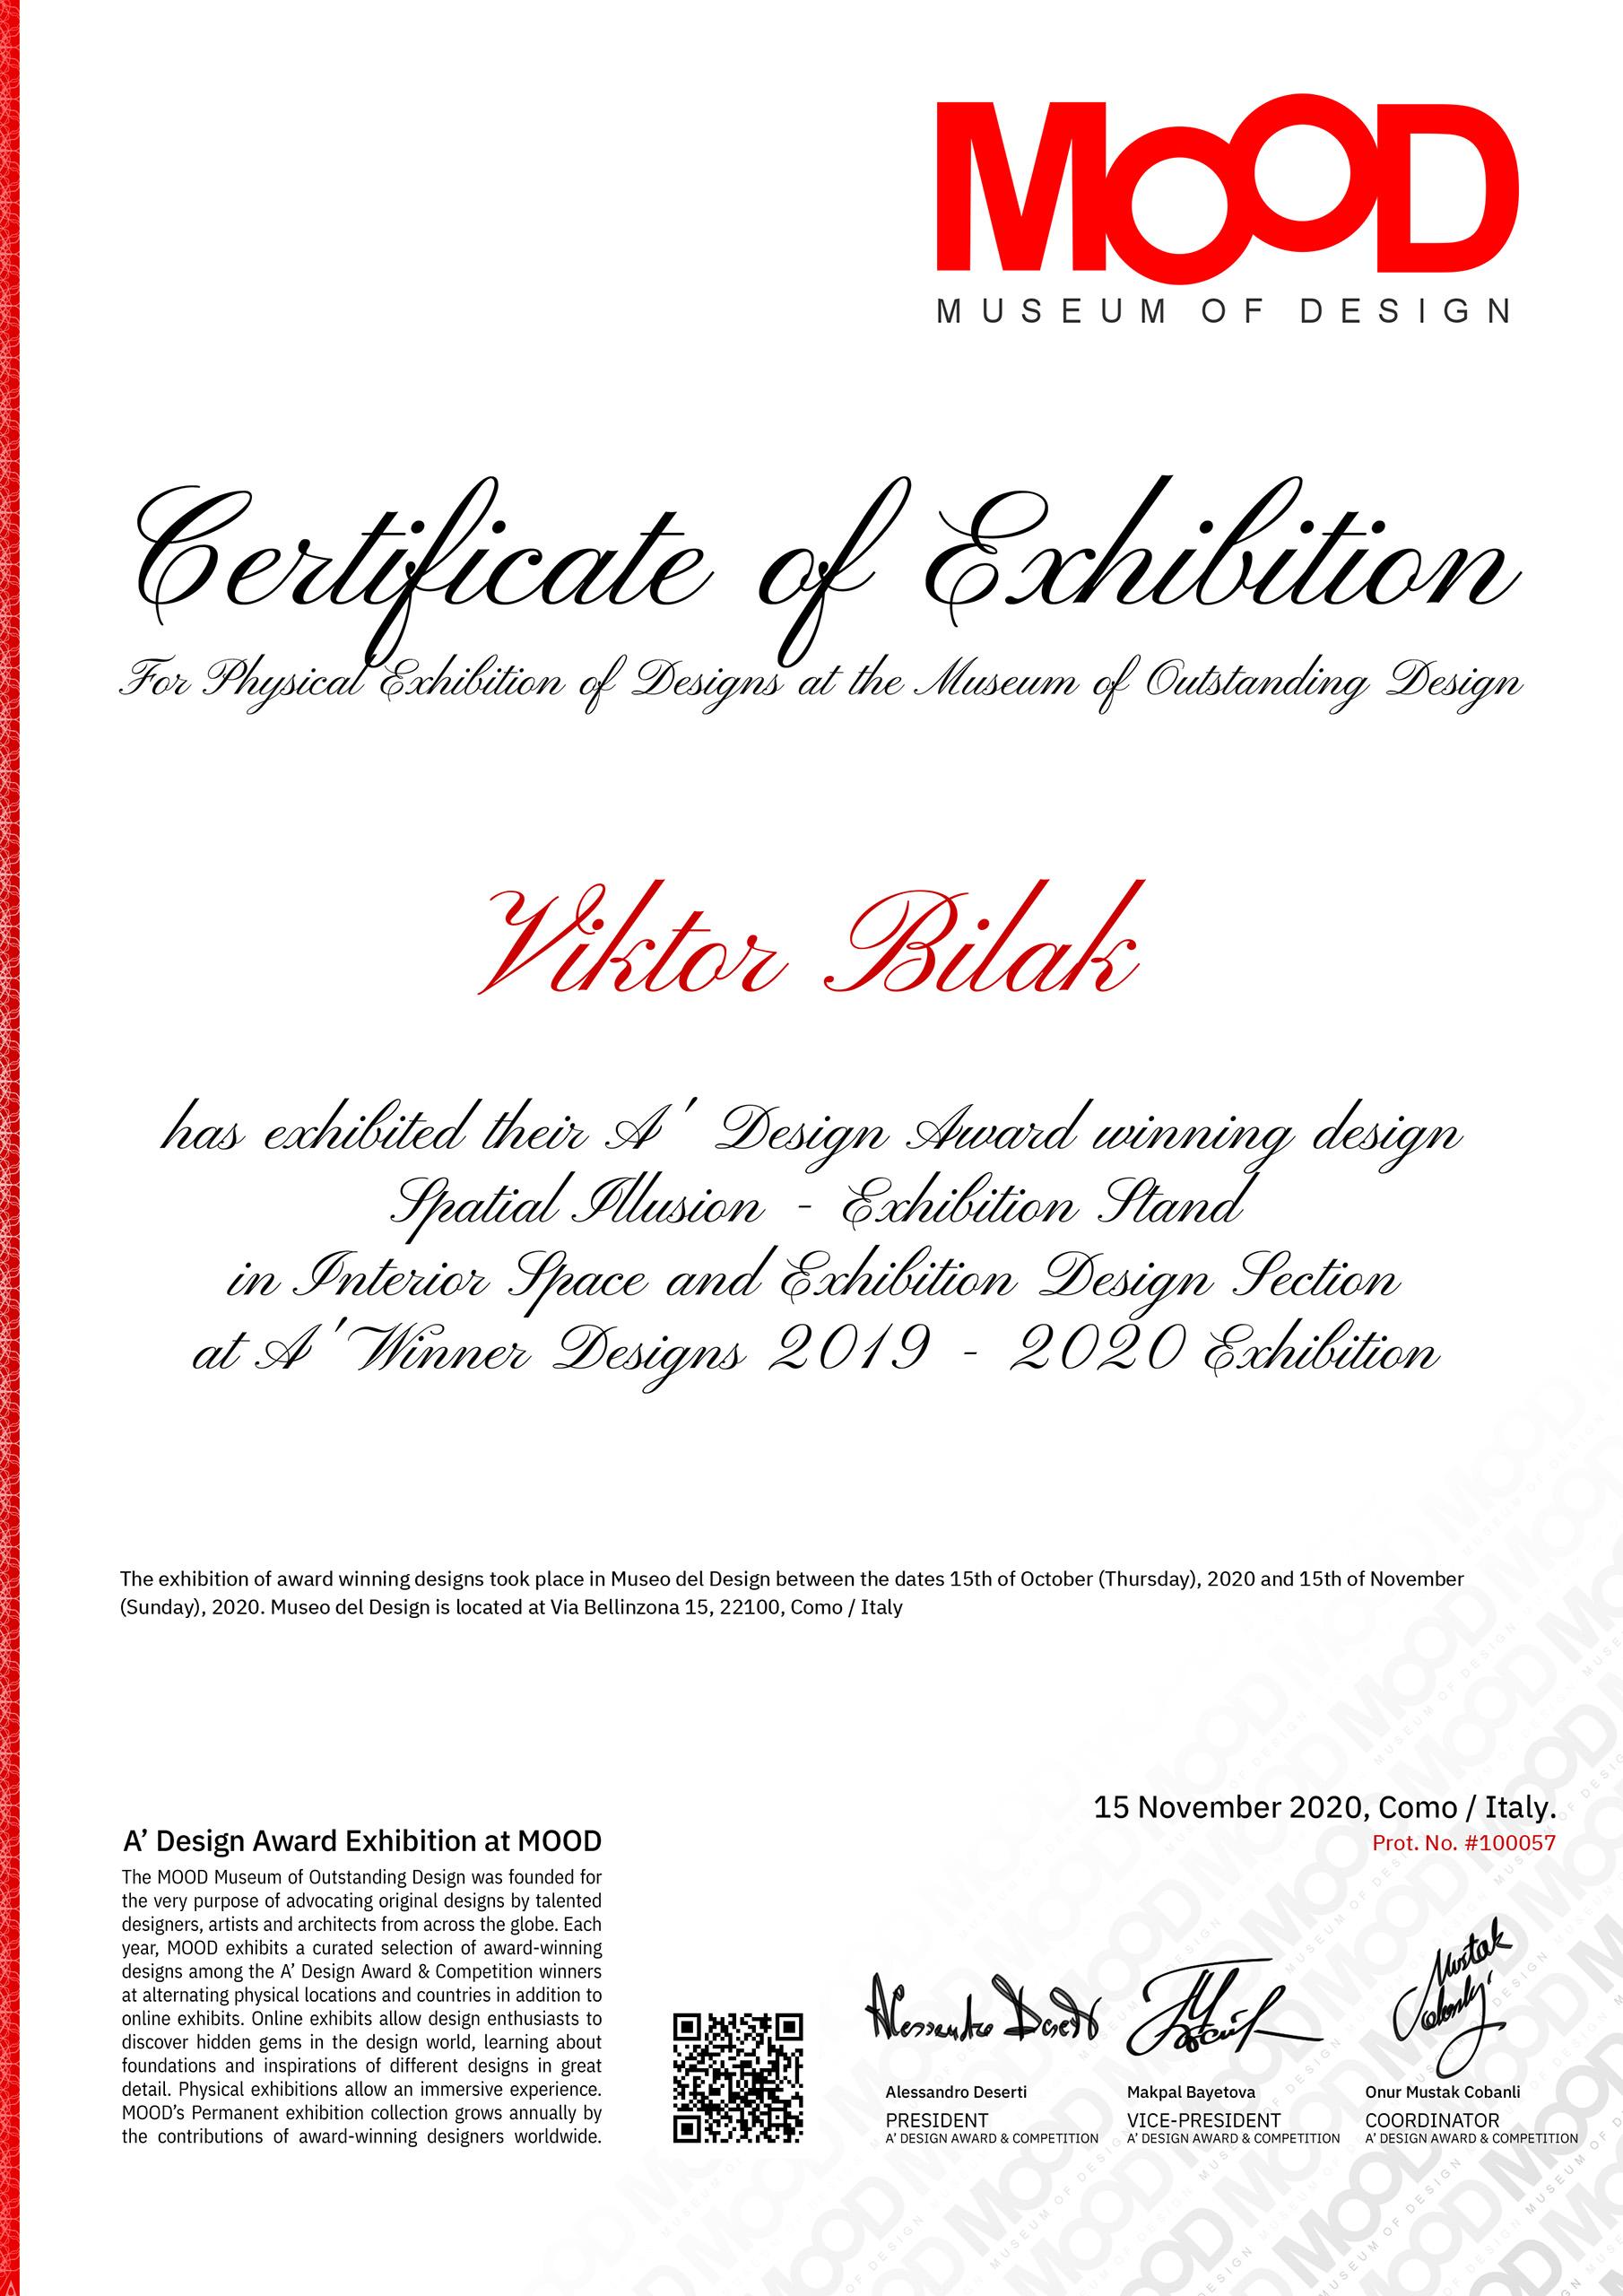 ADA100057-certificate-exhibition_Italy